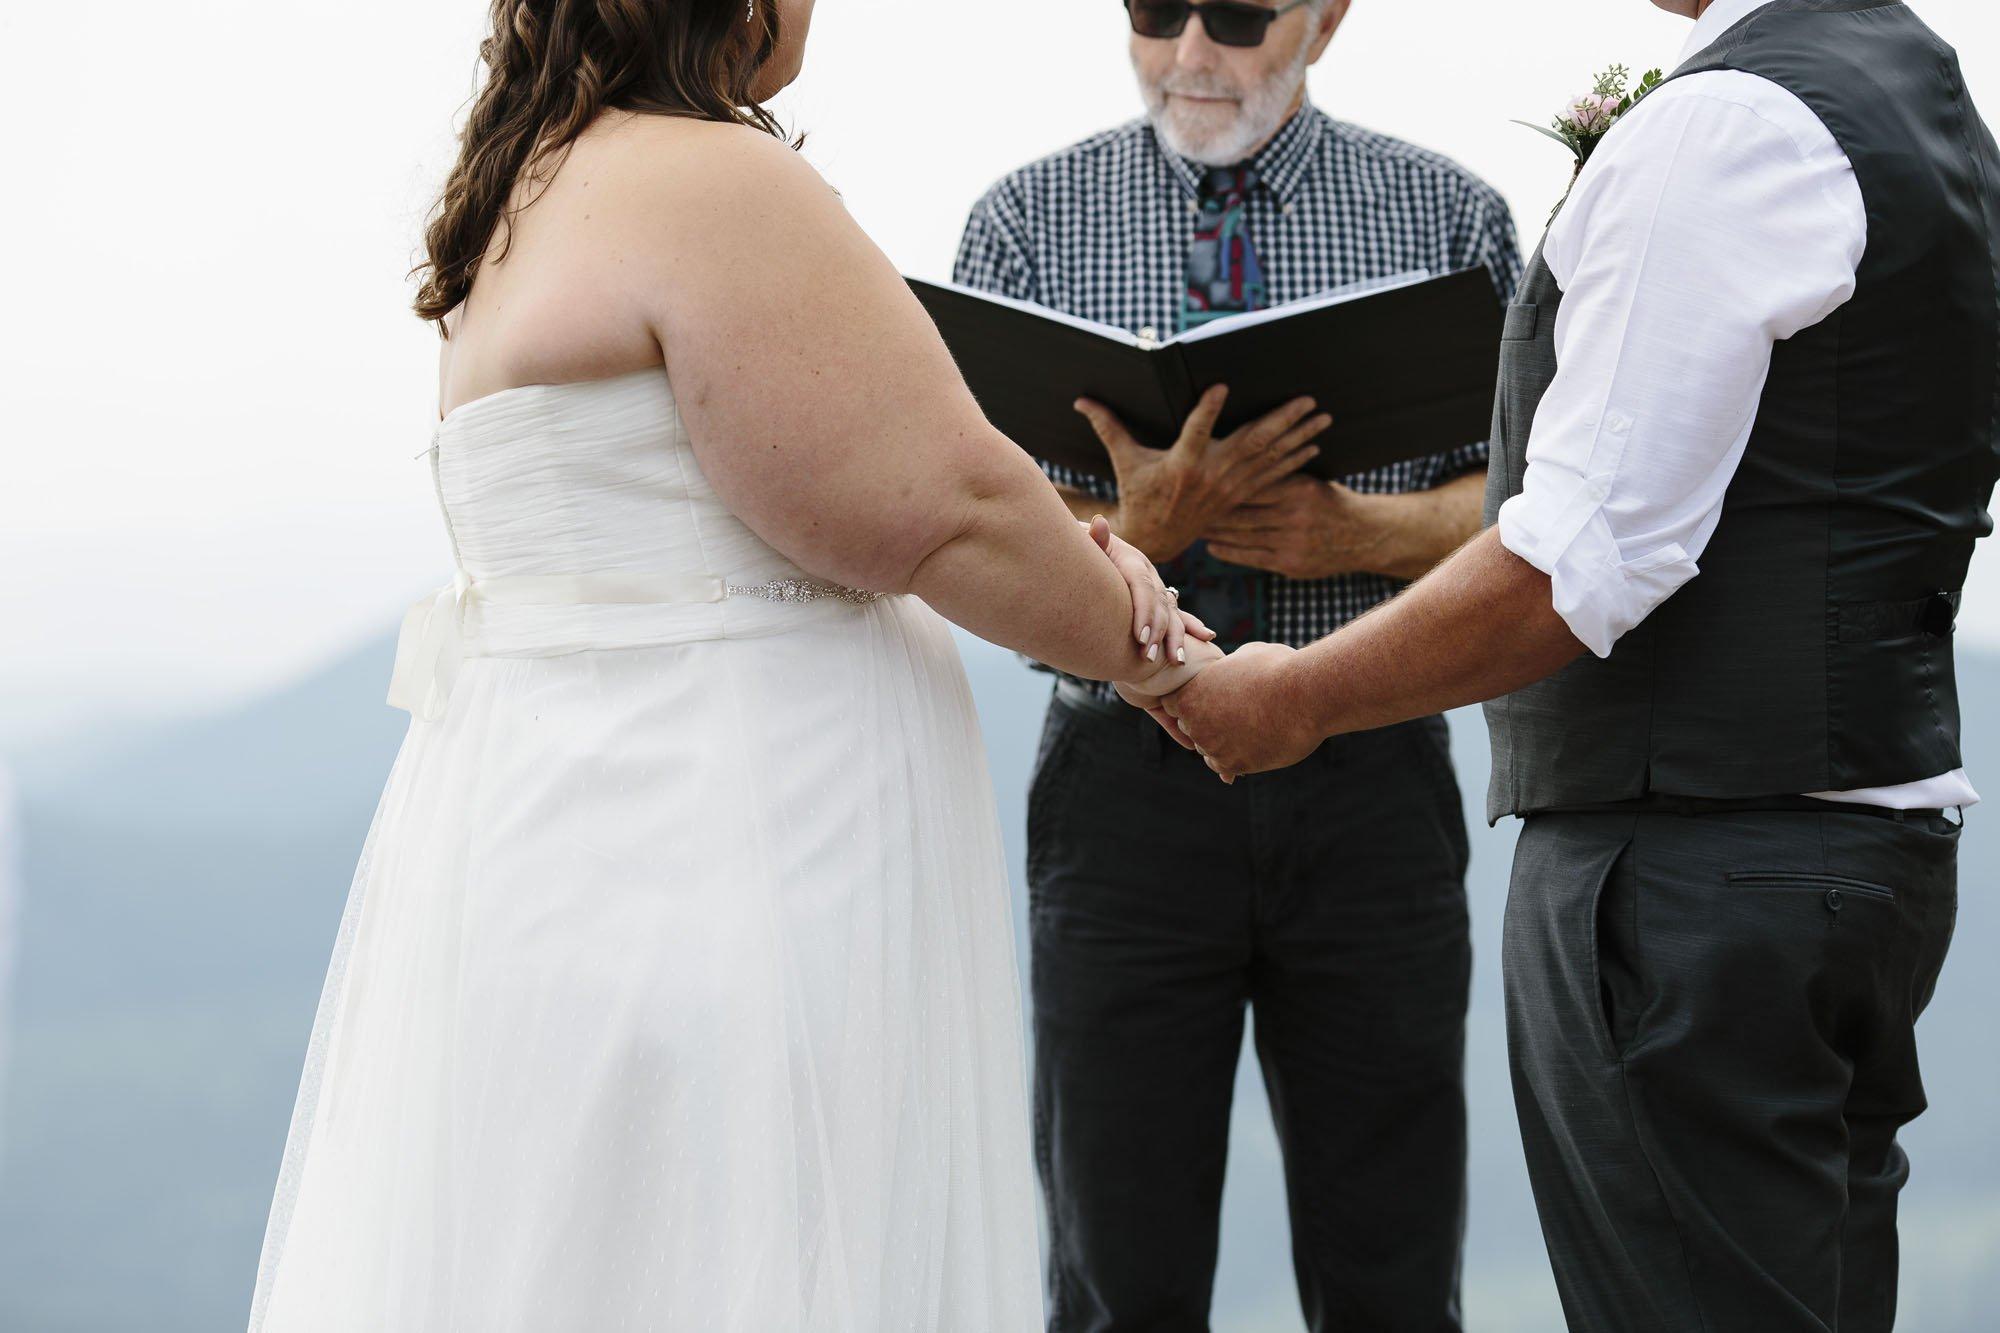 Mt Spokane Elopement Small Wedding // Emily Wenzel Photography